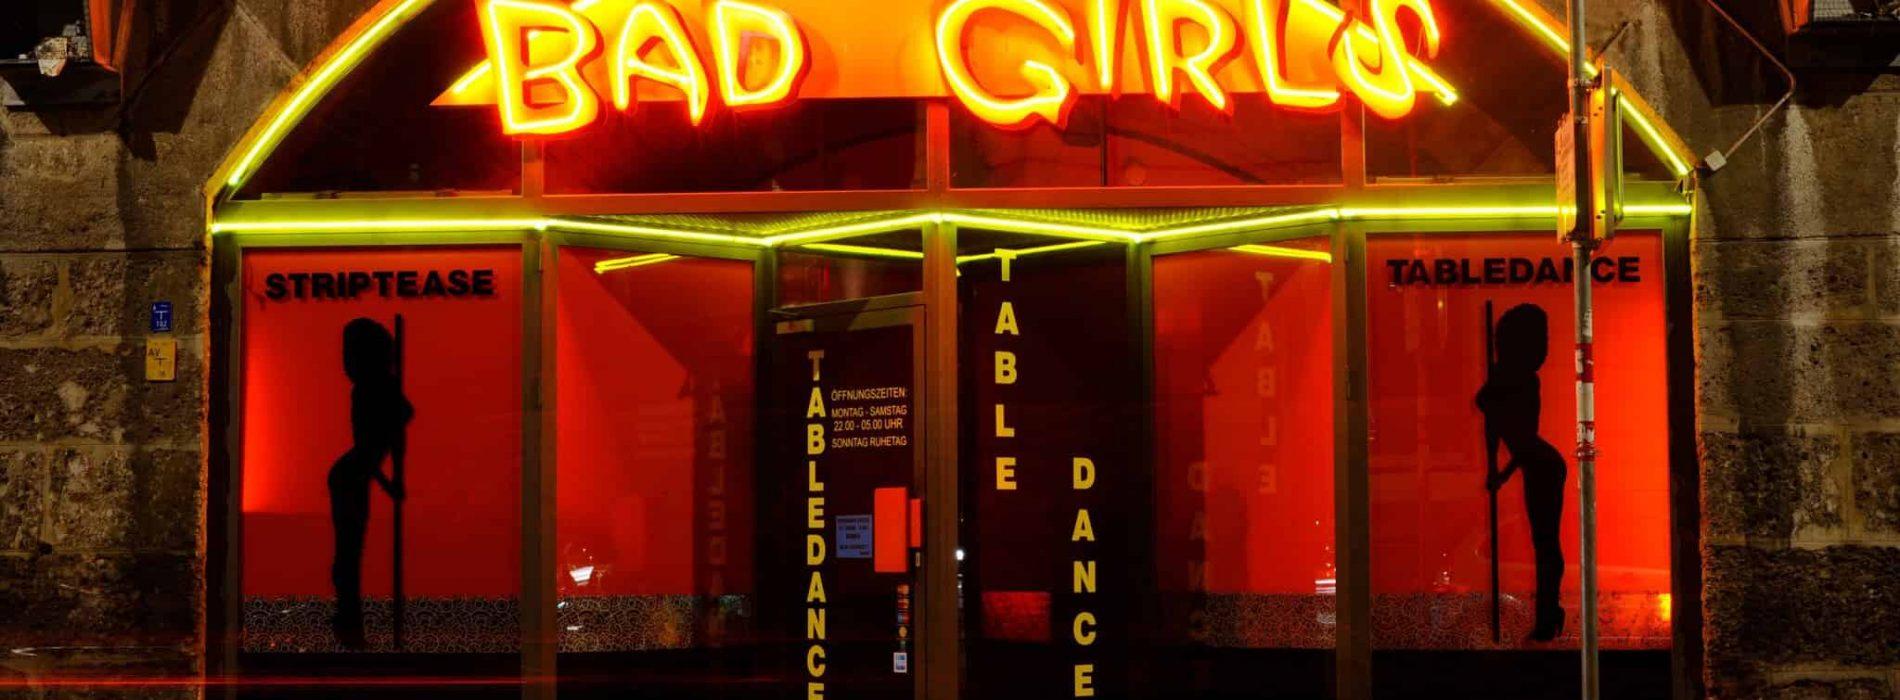 Bad Girls Tabledance